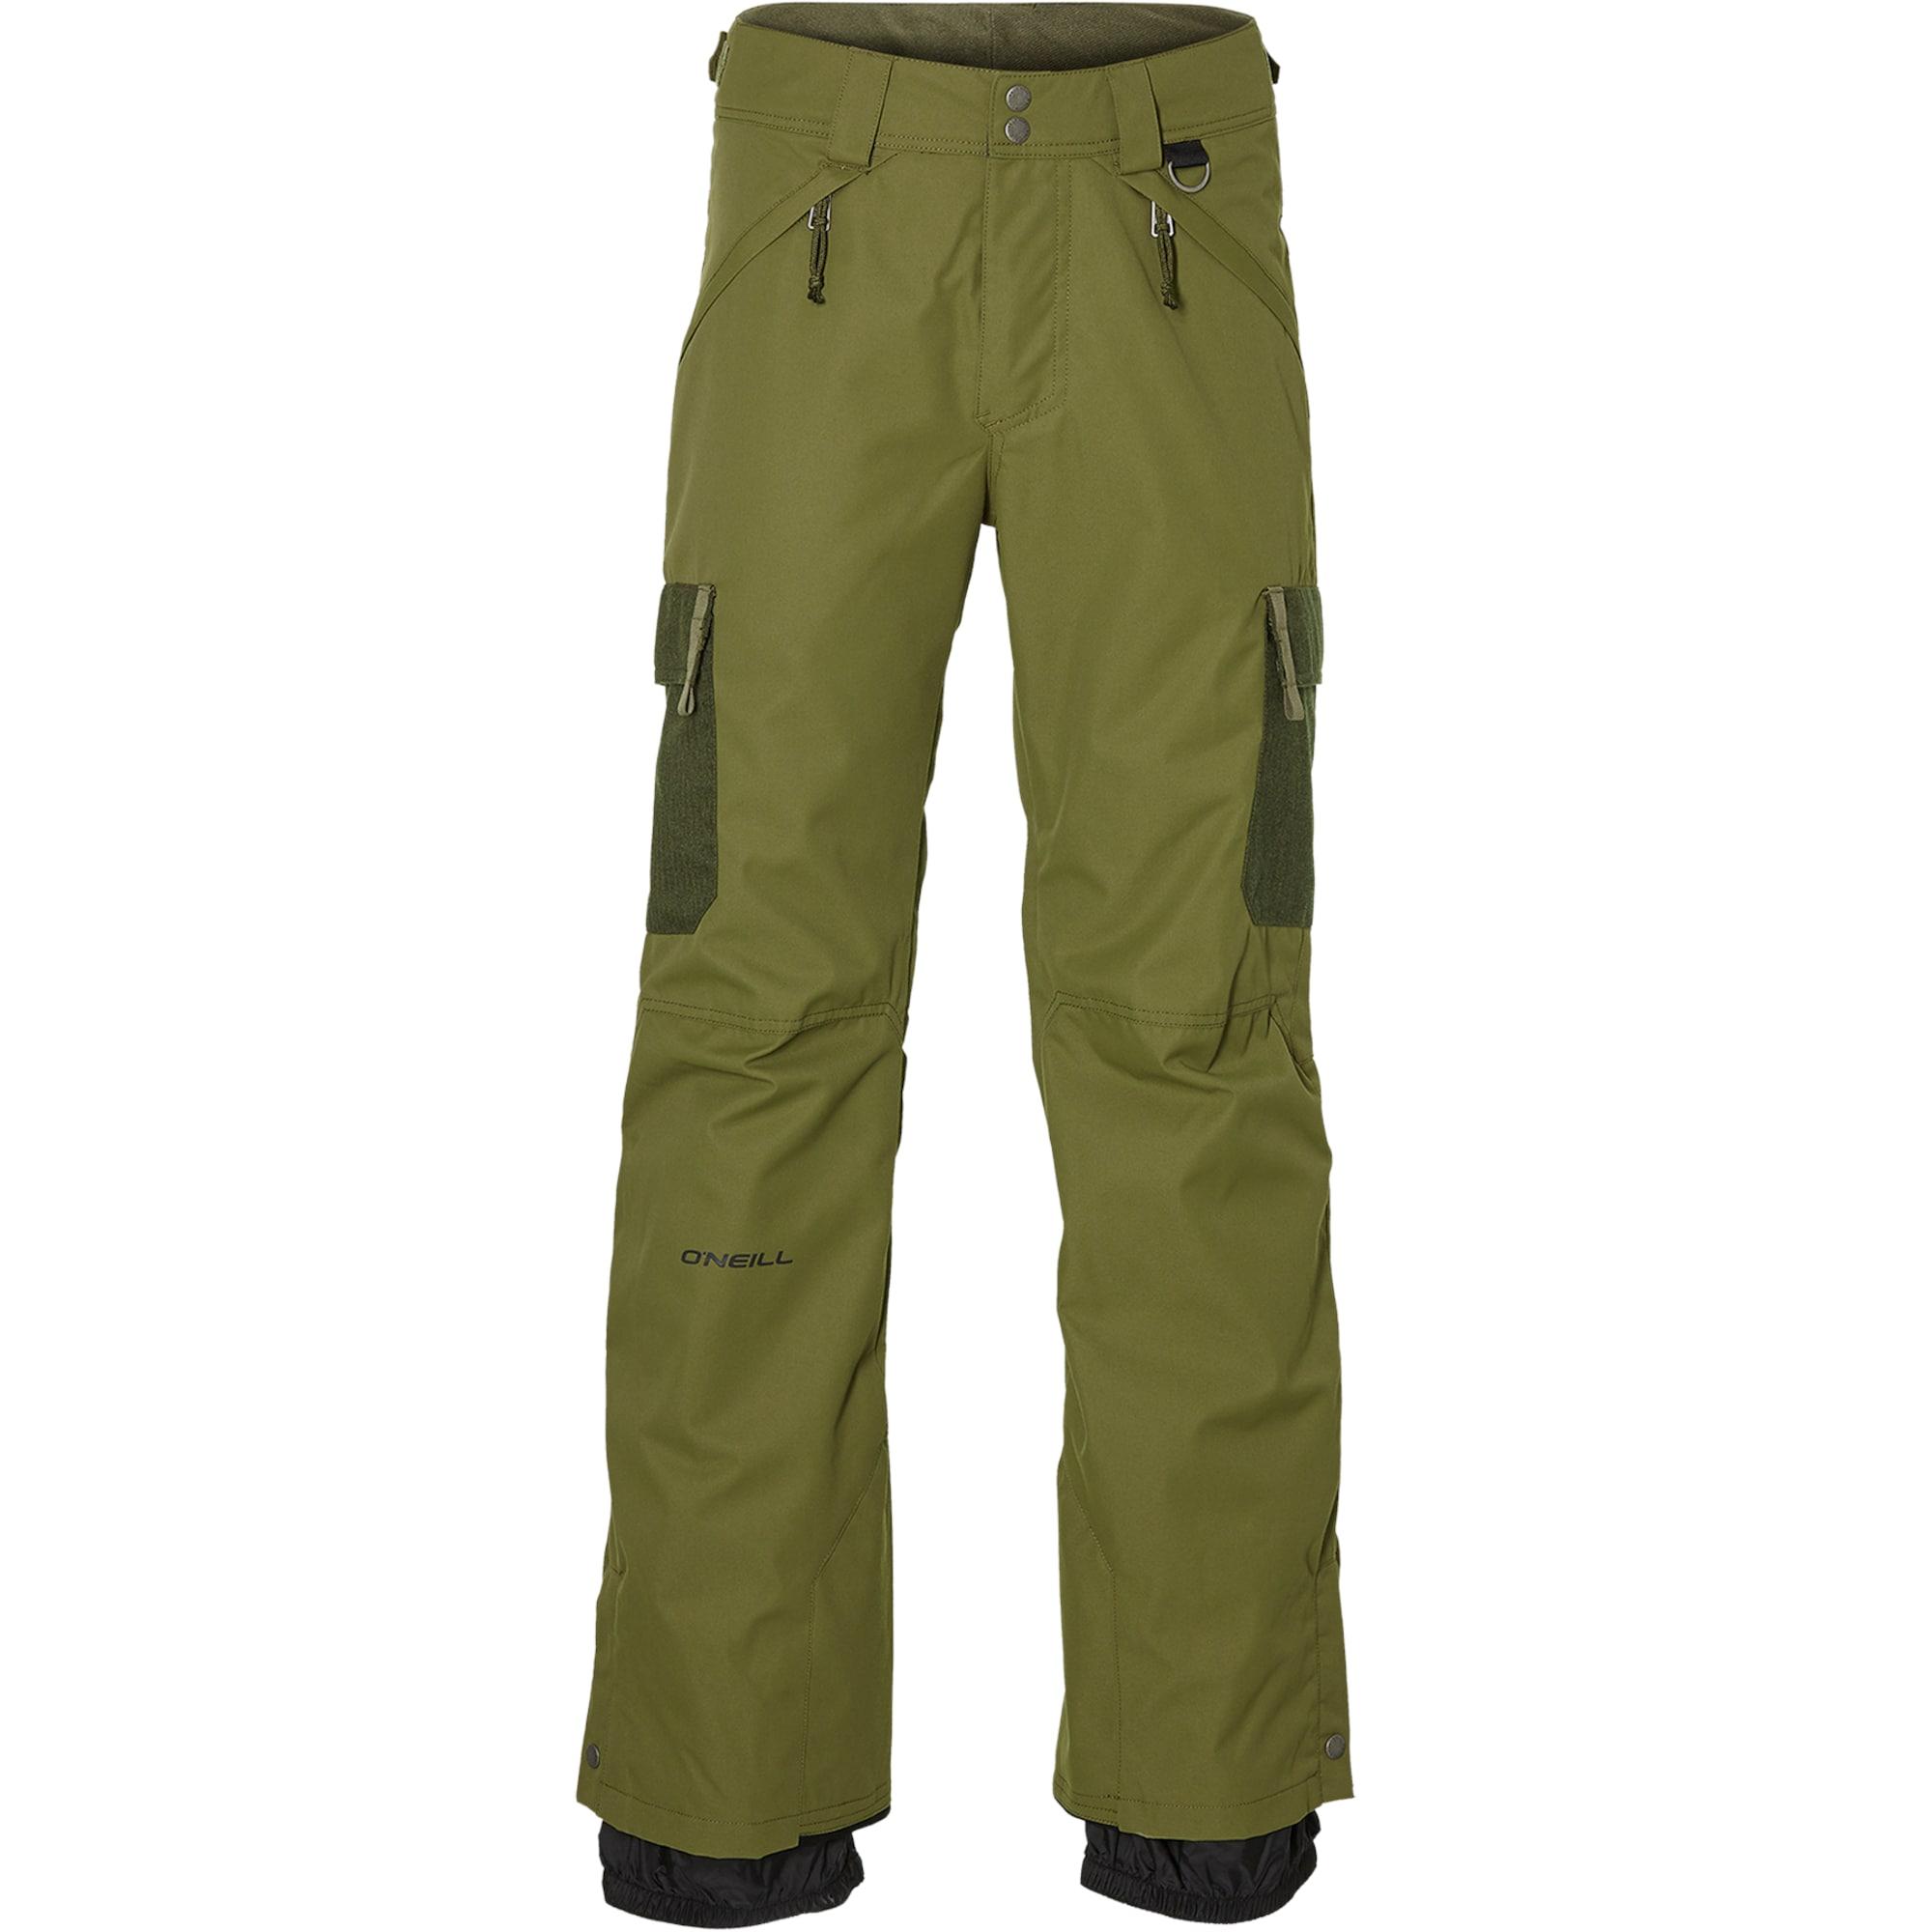 ONEILL Outdoorové kalhoty Hybrid Friday khaki O'NEILL